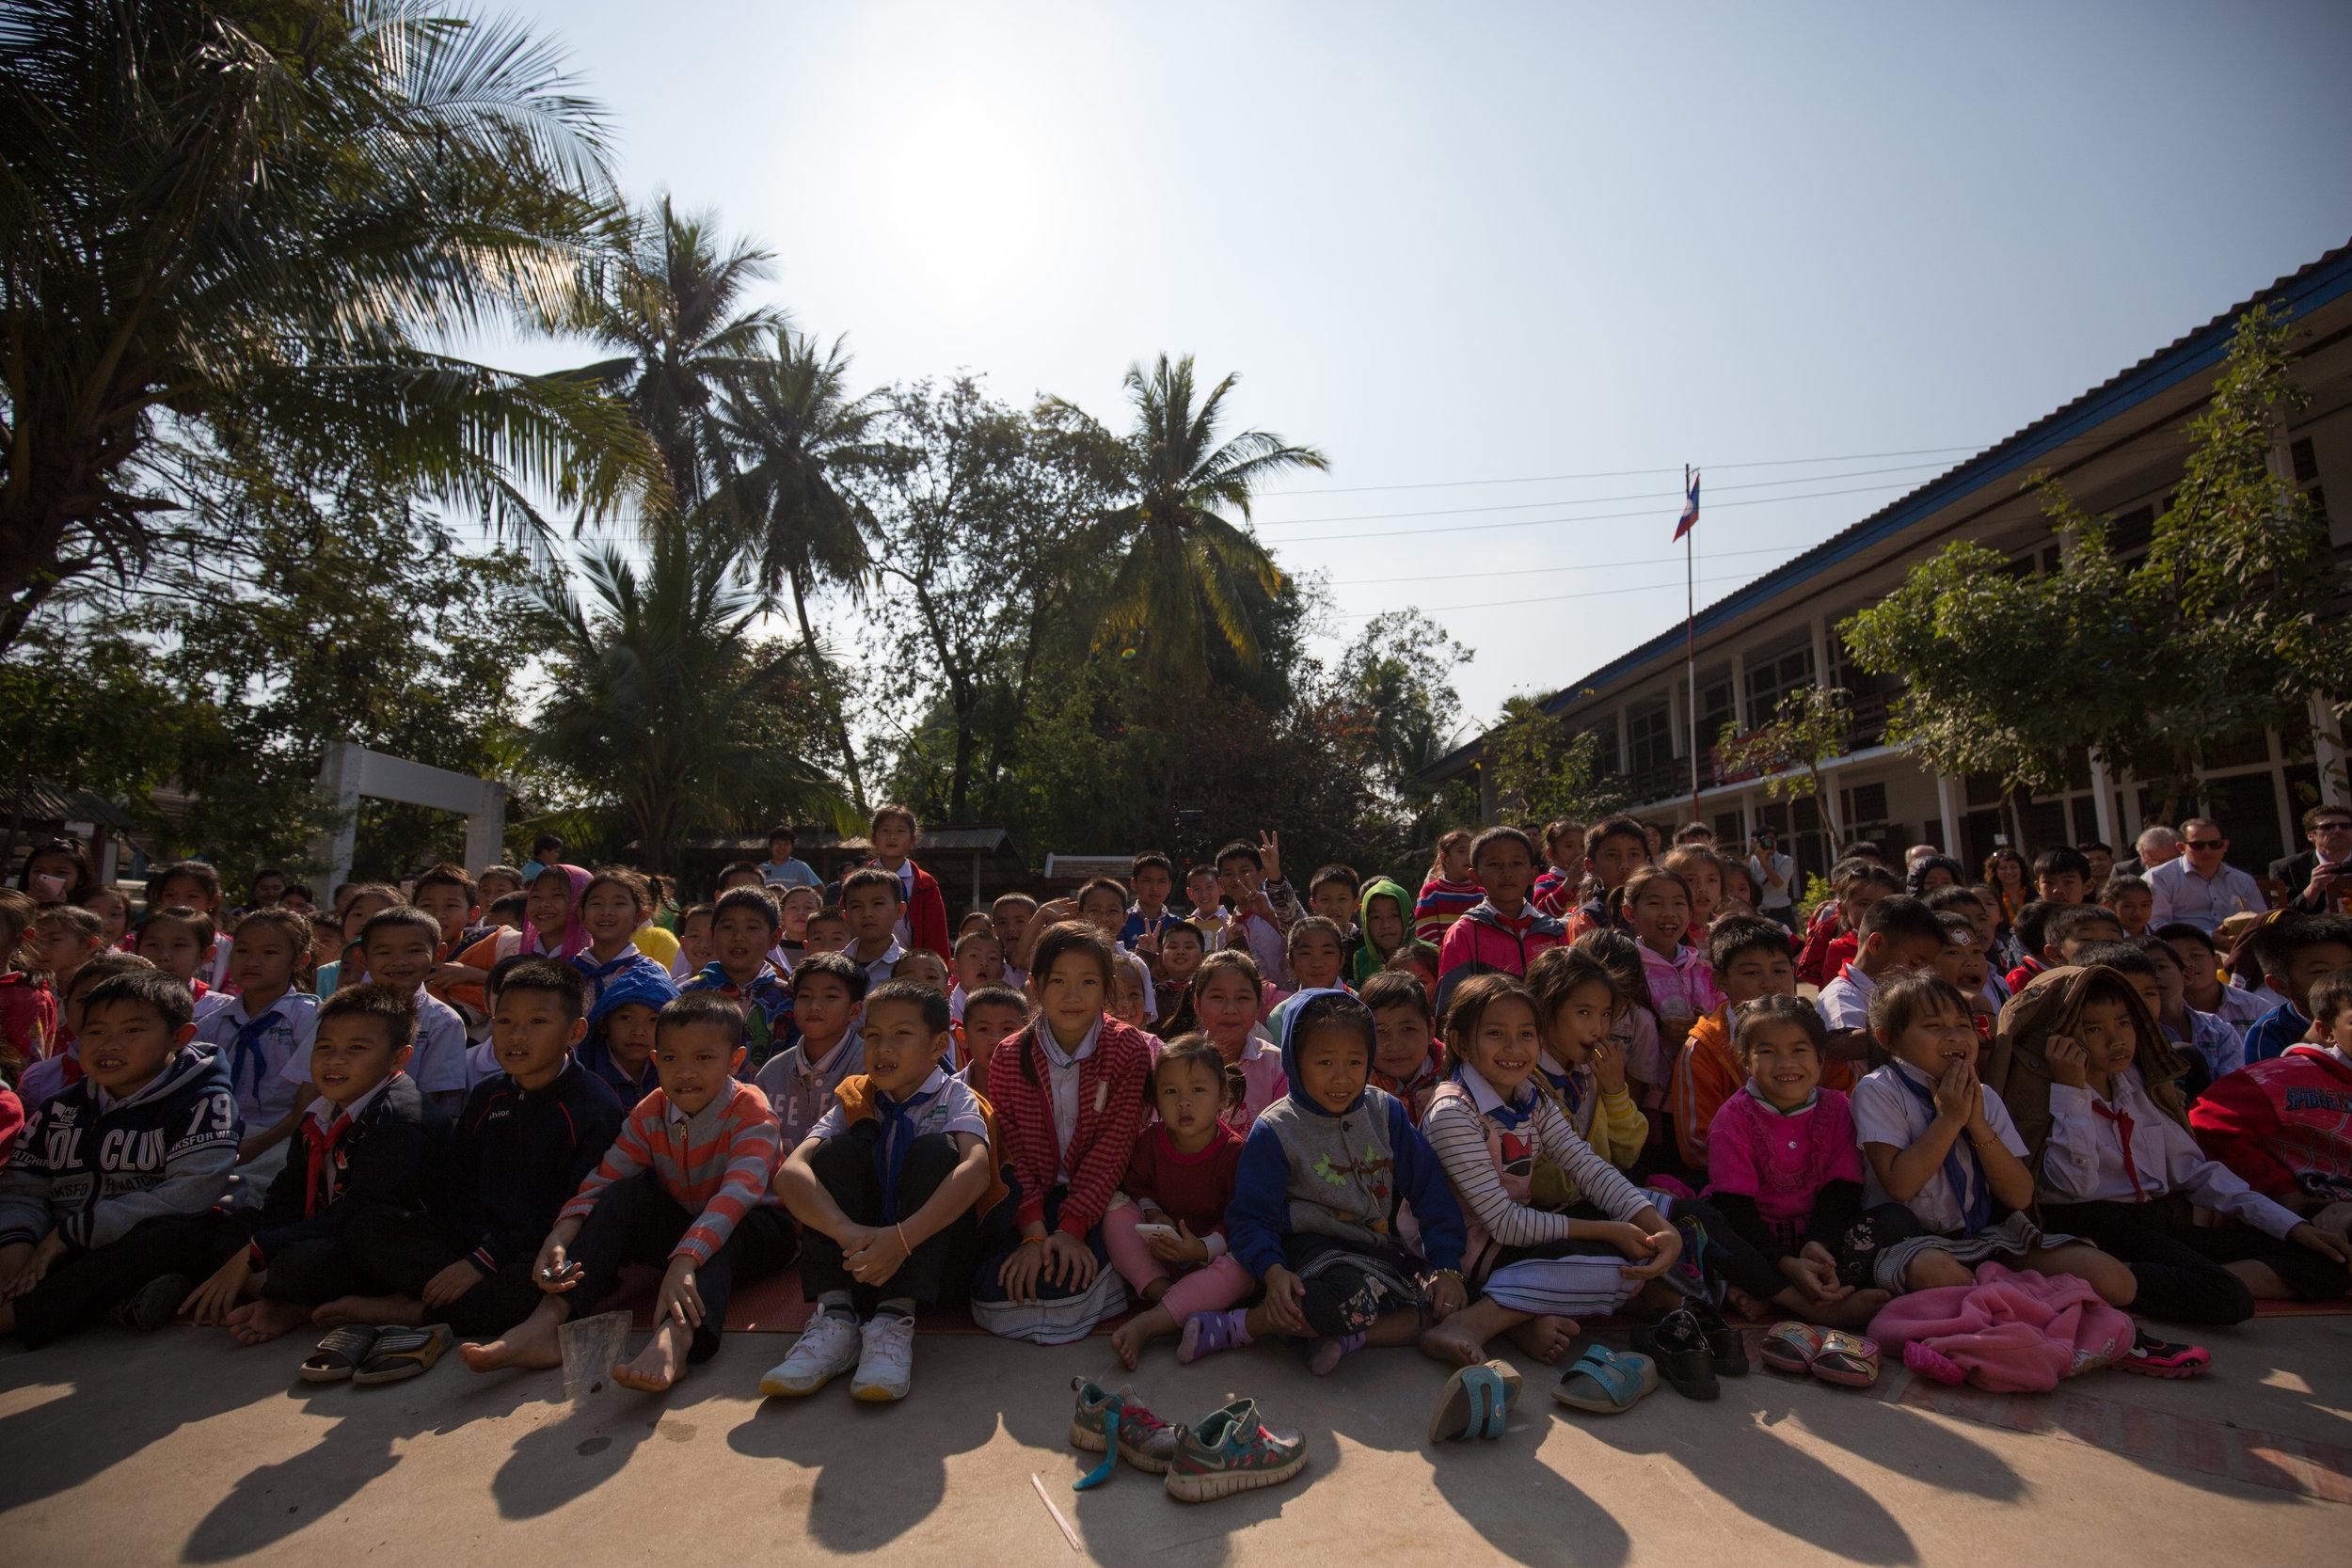 Laos-Luang-Prabang-GIZ-German-Parliament-waste-performance-Photo-by-Cyril-Eberle-CEB_2674.jpg